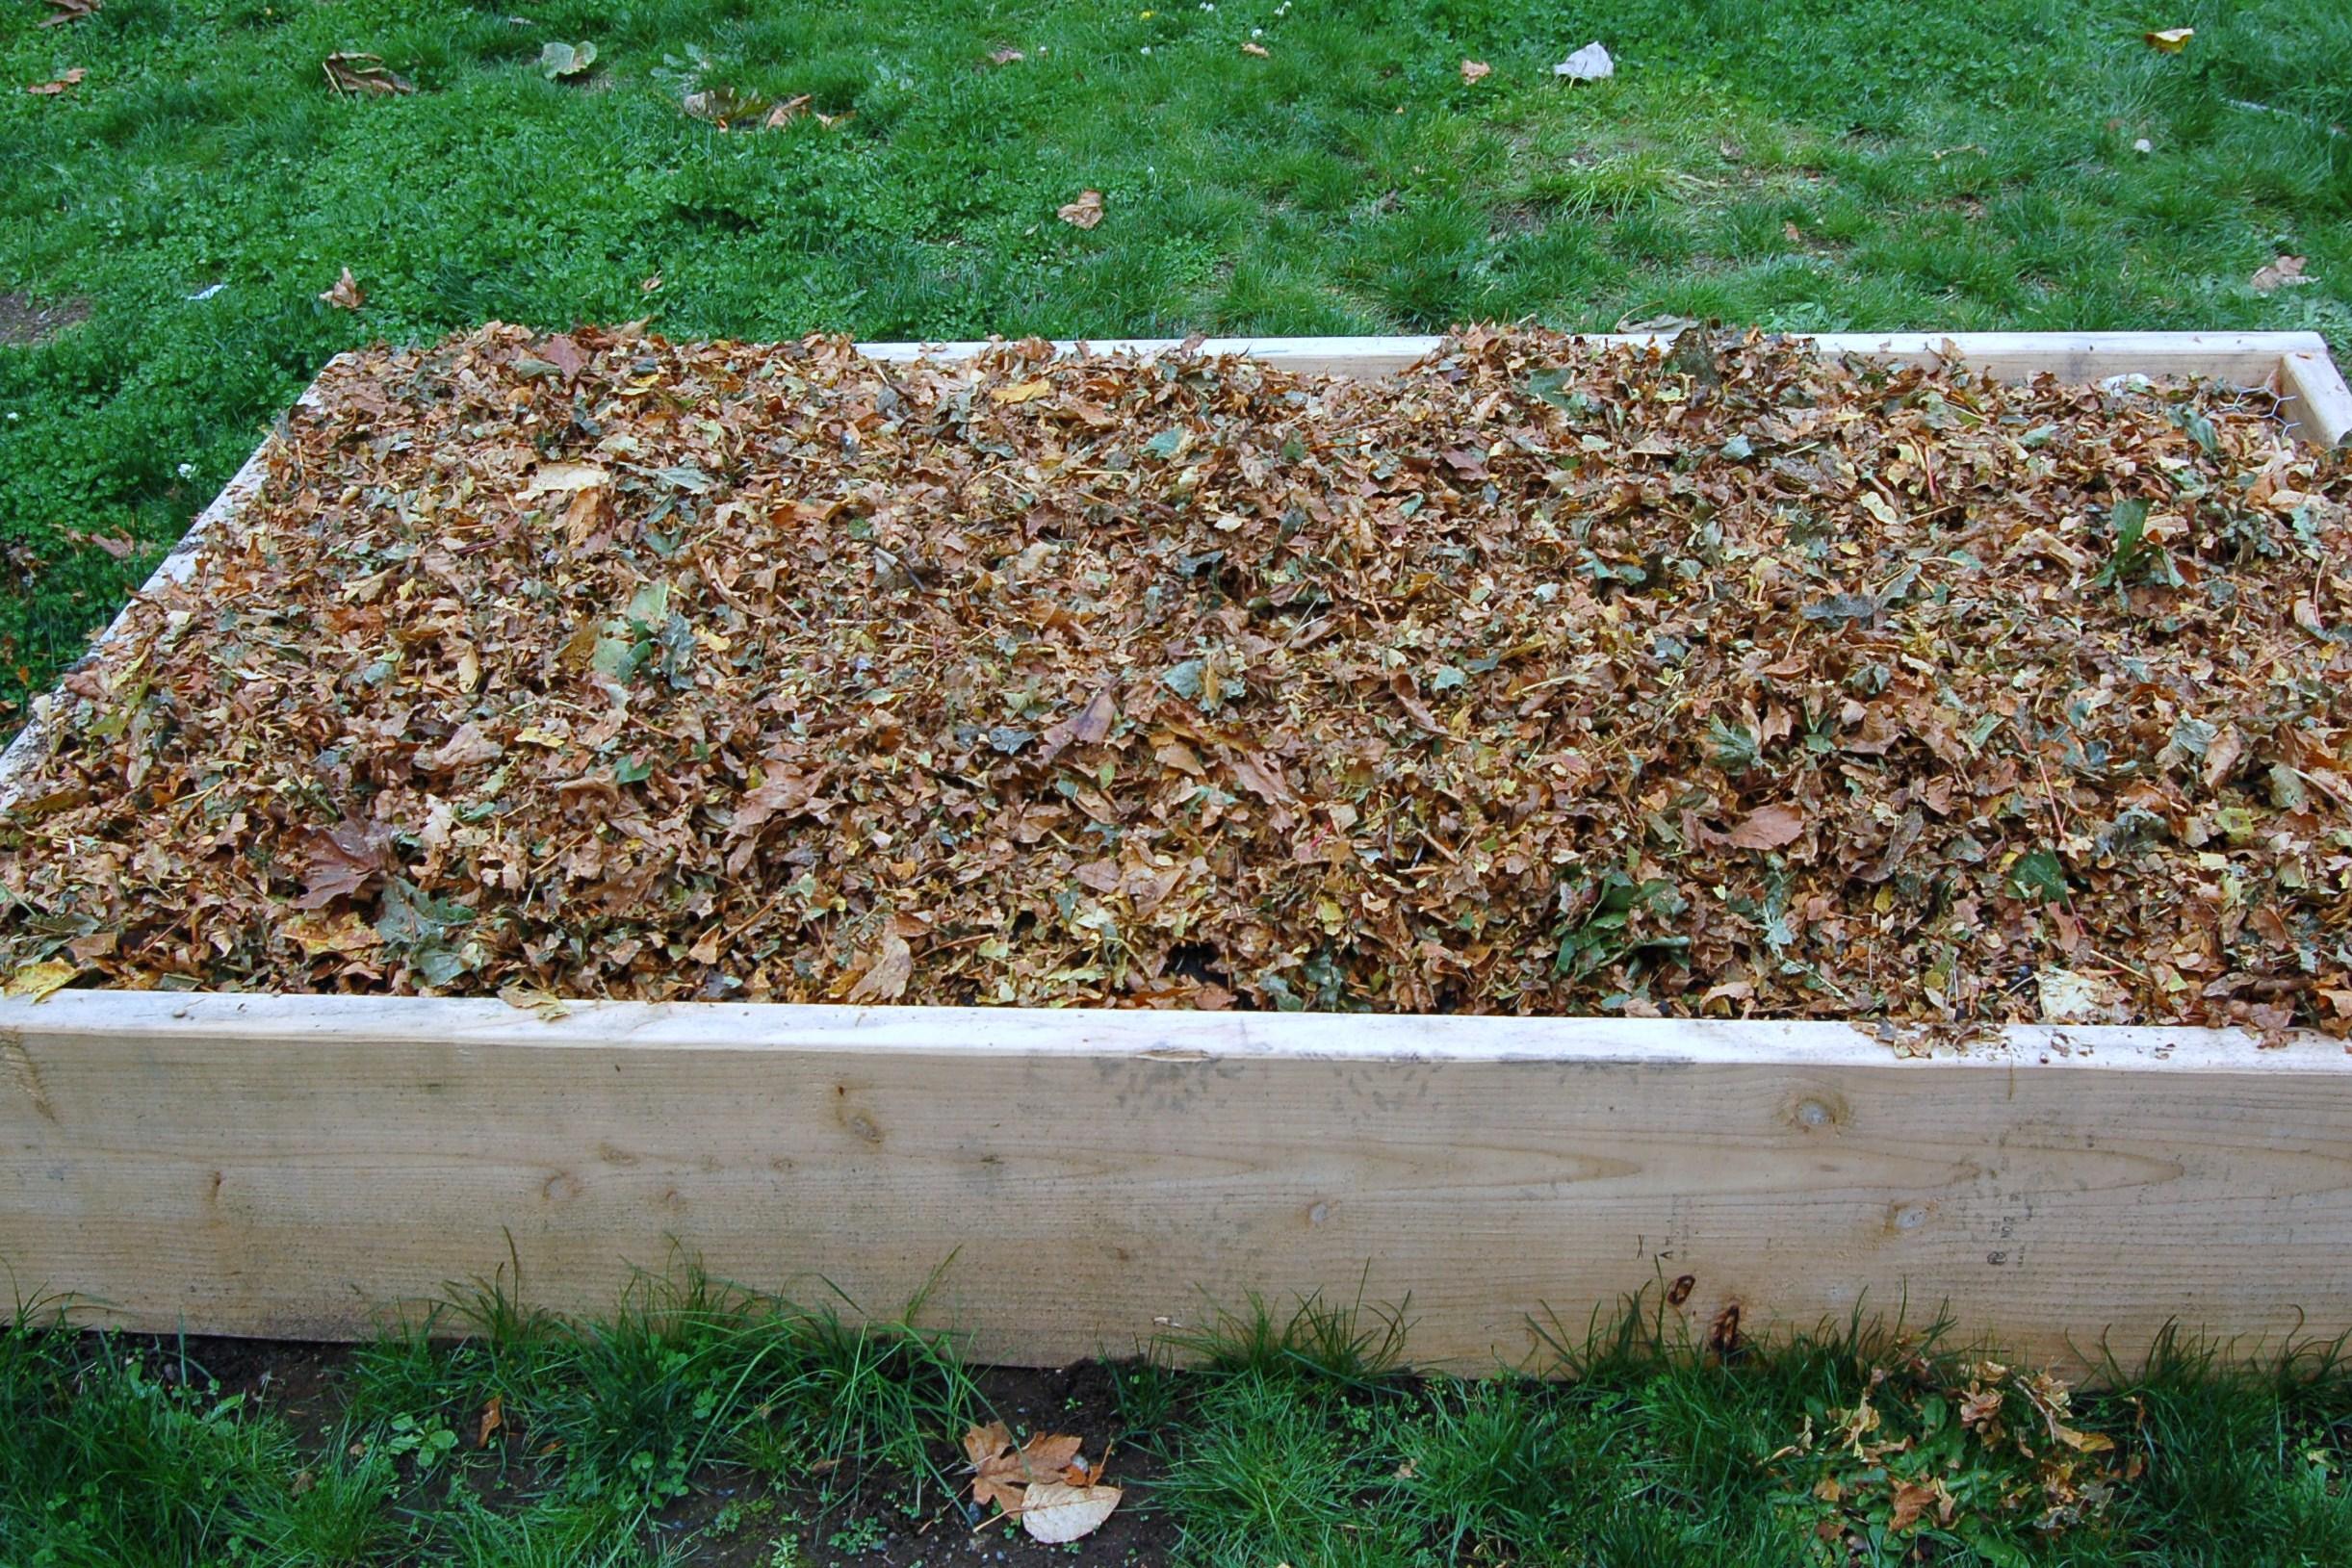 Leaf mulch in raised beds